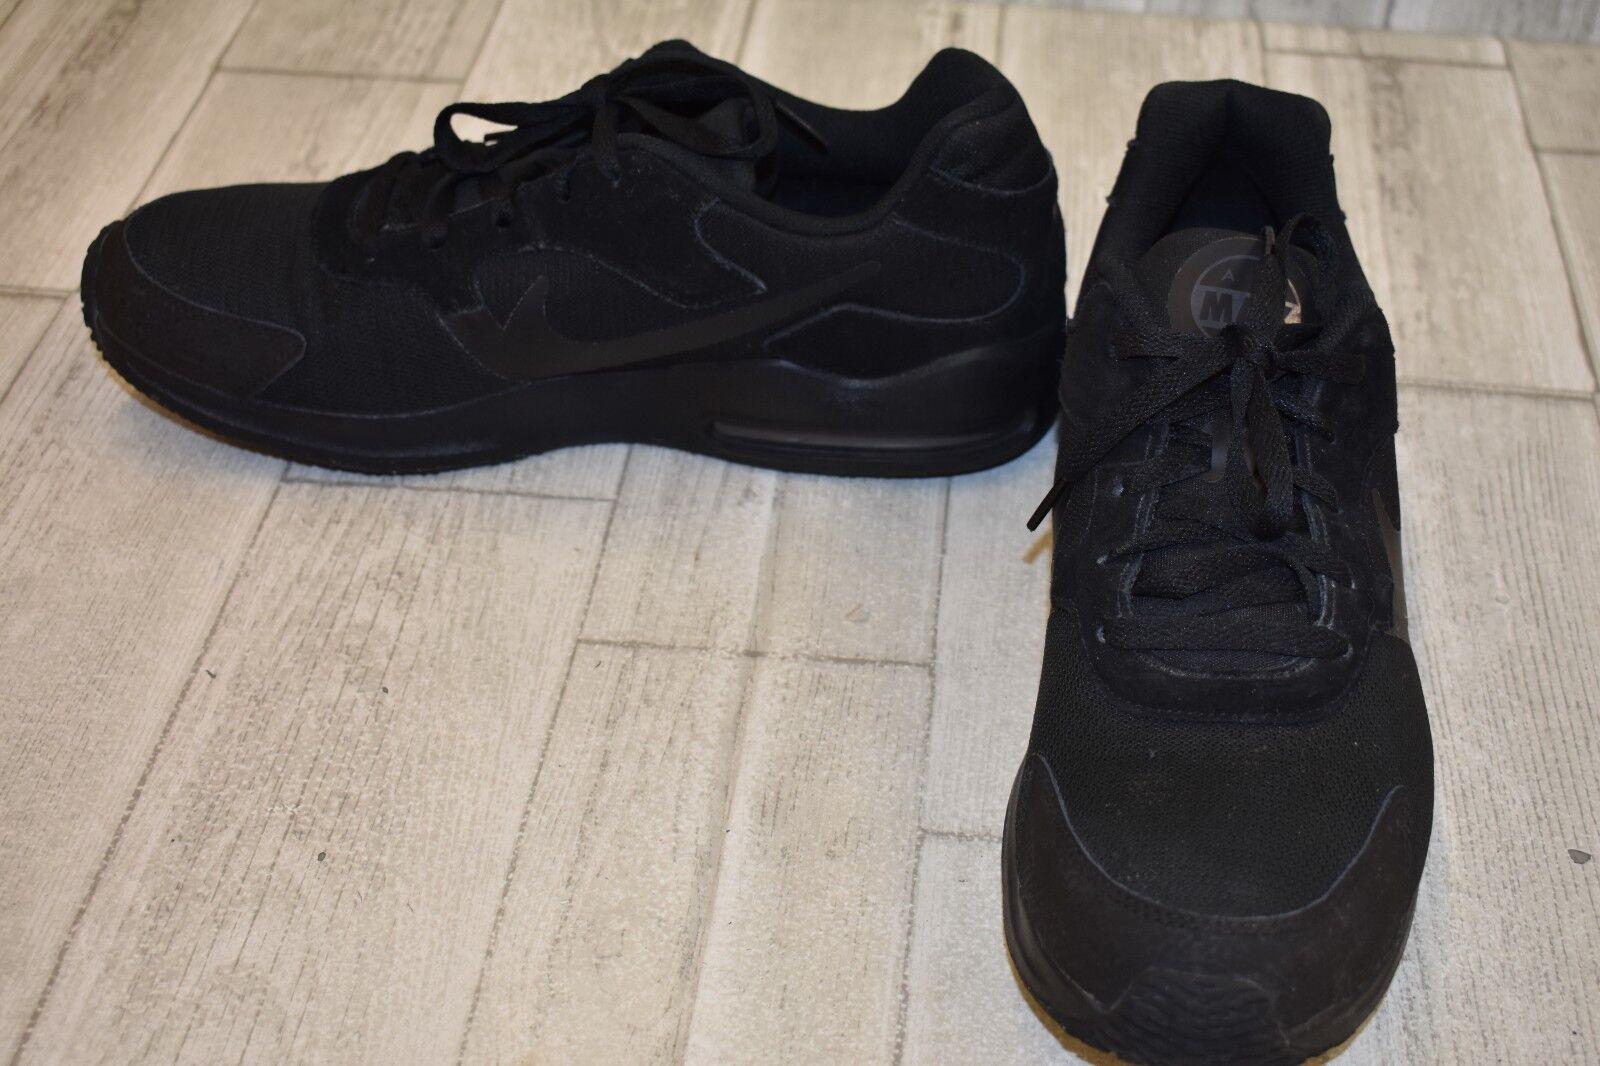 Nike air max guile athletic, scarpe da ginnastica, uomo 11,5, nero | Distinctive  | Gentiluomo/Signora Scarpa